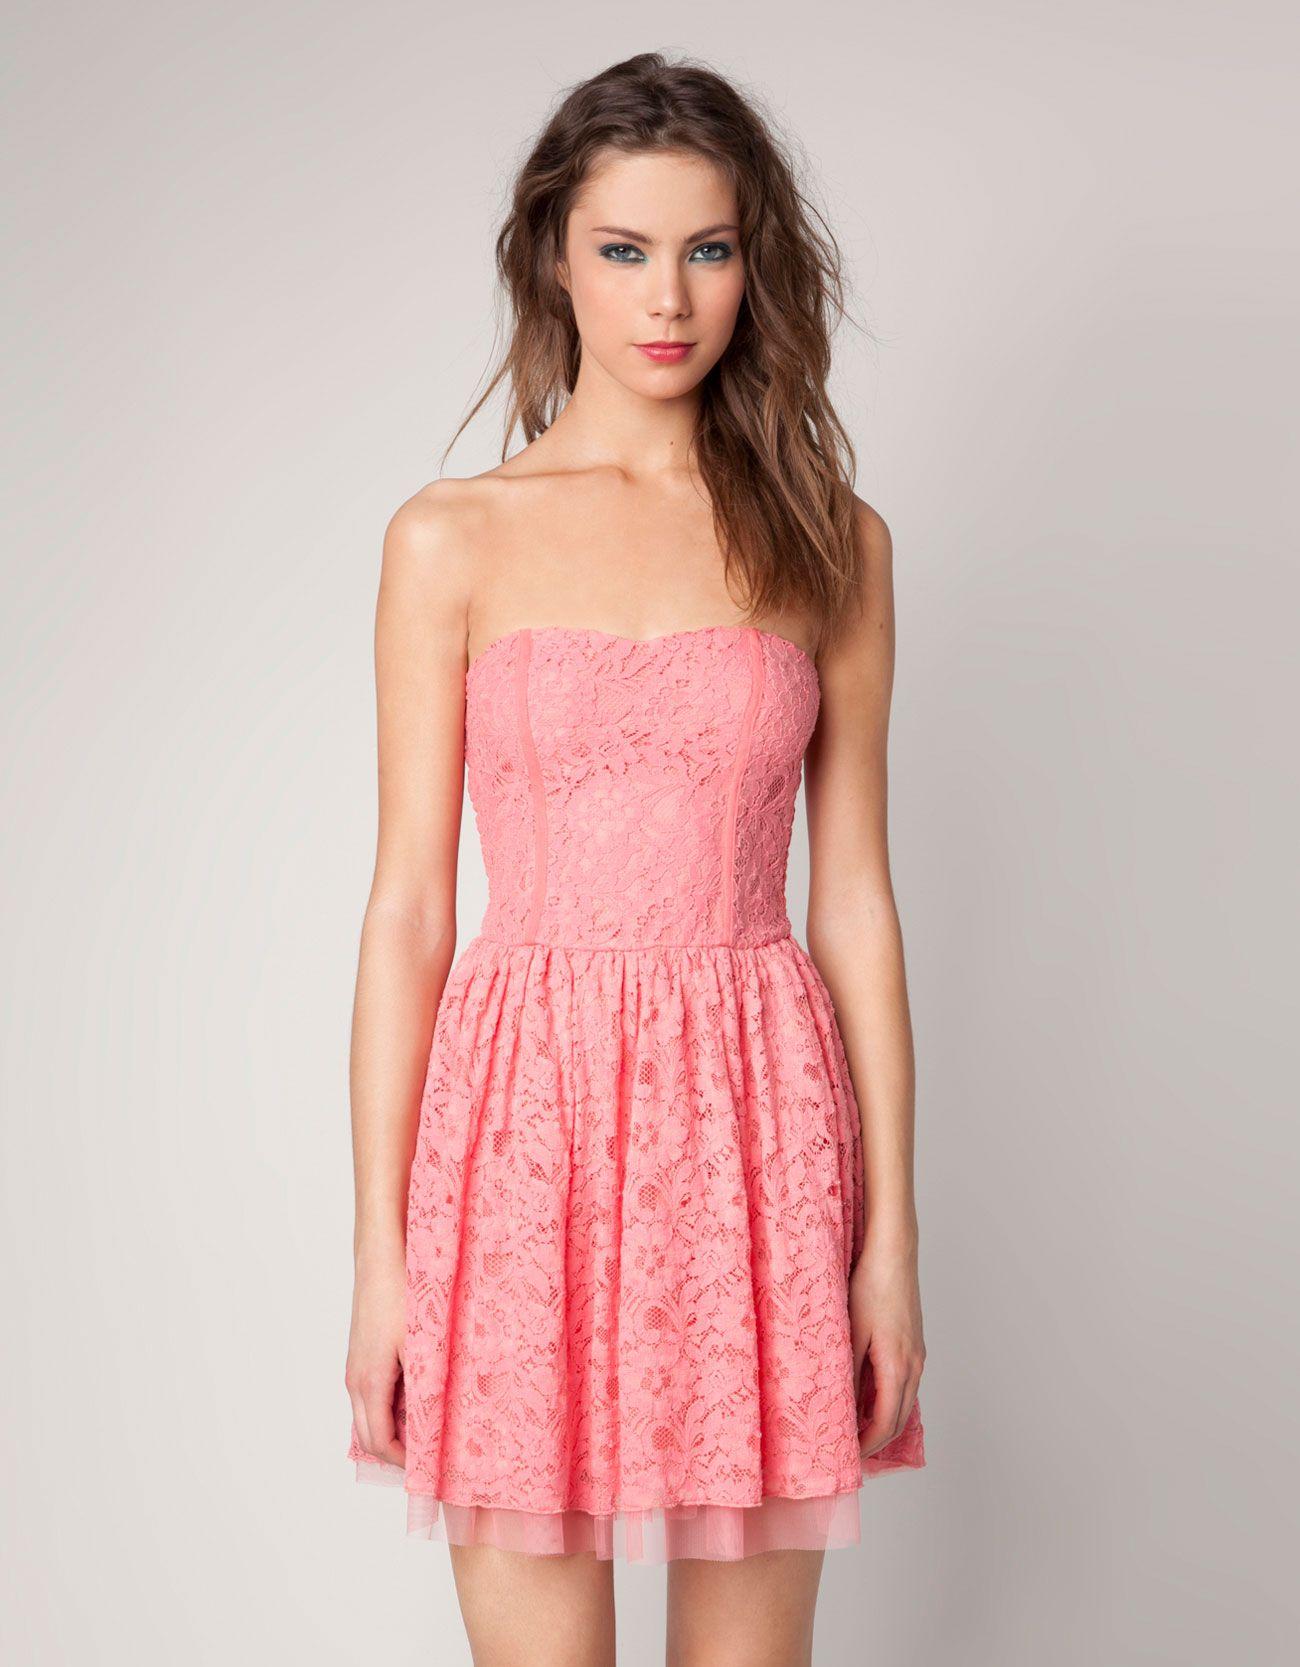 pink lace dress | dresses | Pinterest | Me encantas, Encanta y Bershka